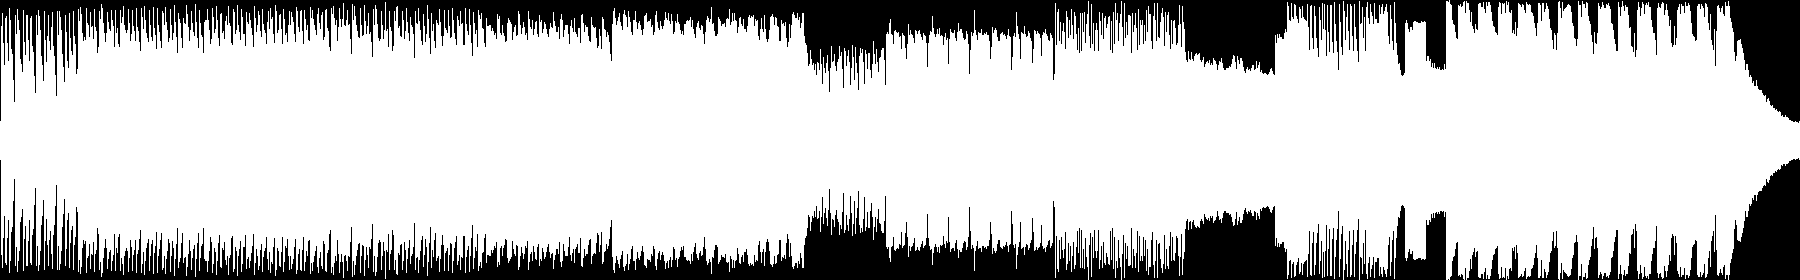 Kappadokia by Basement Freaks audio waveform